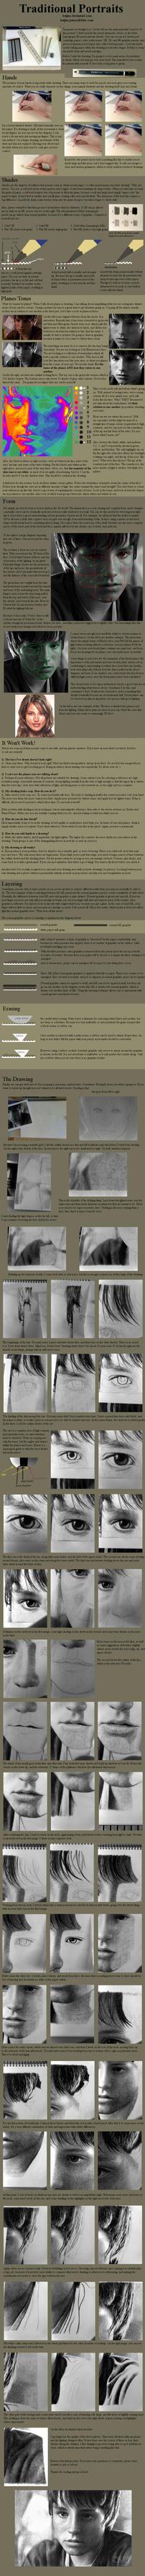 Tutorial - Graphite:Portraits by treijim